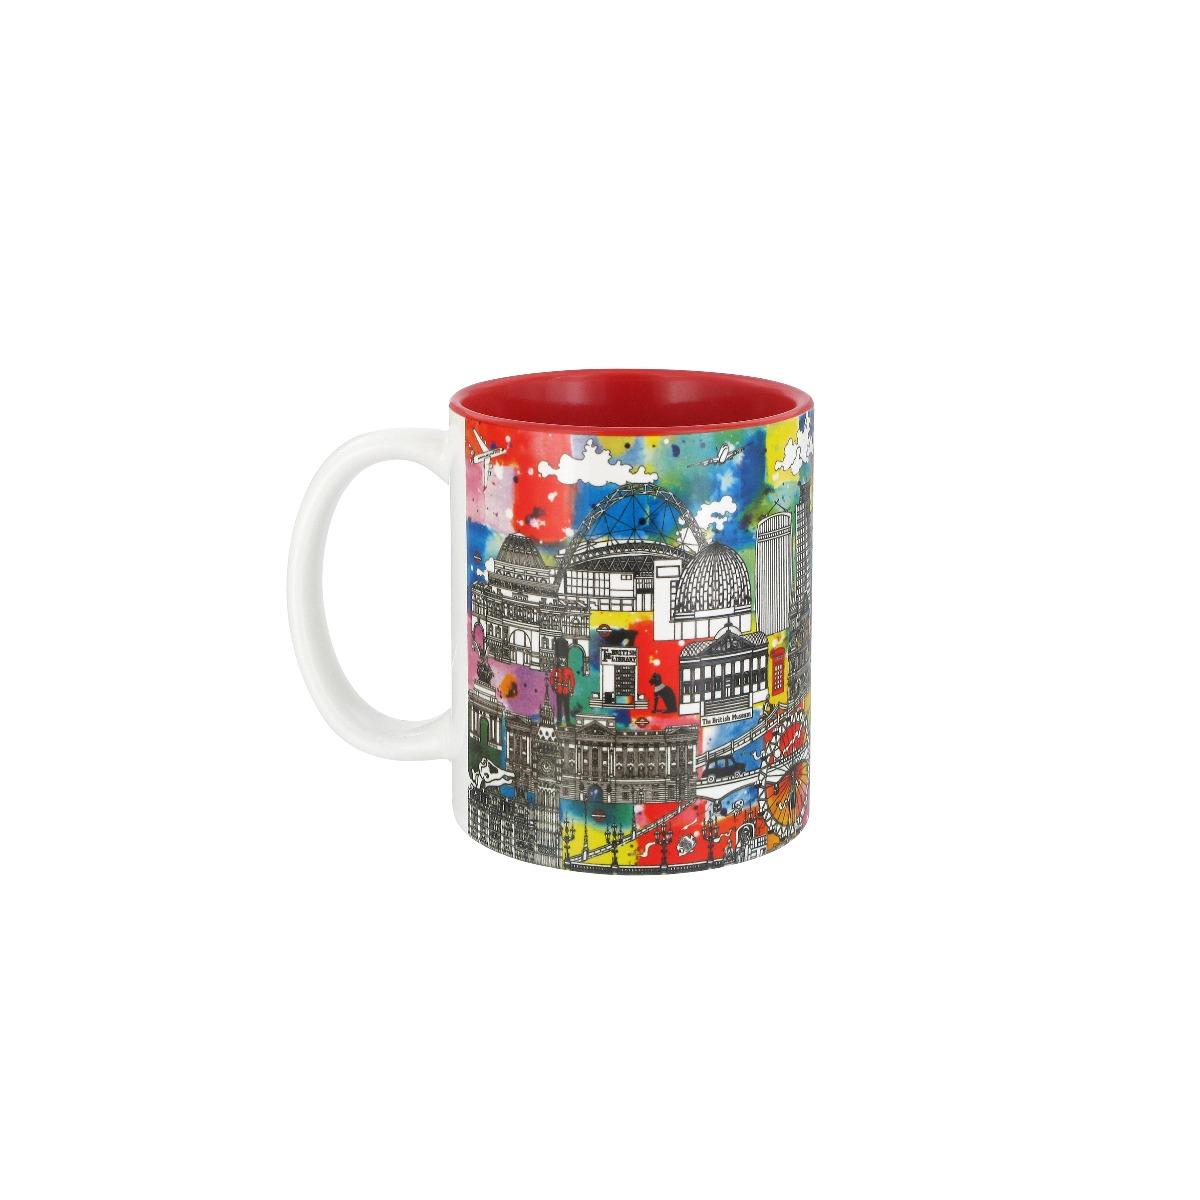 Coloursplash London mug